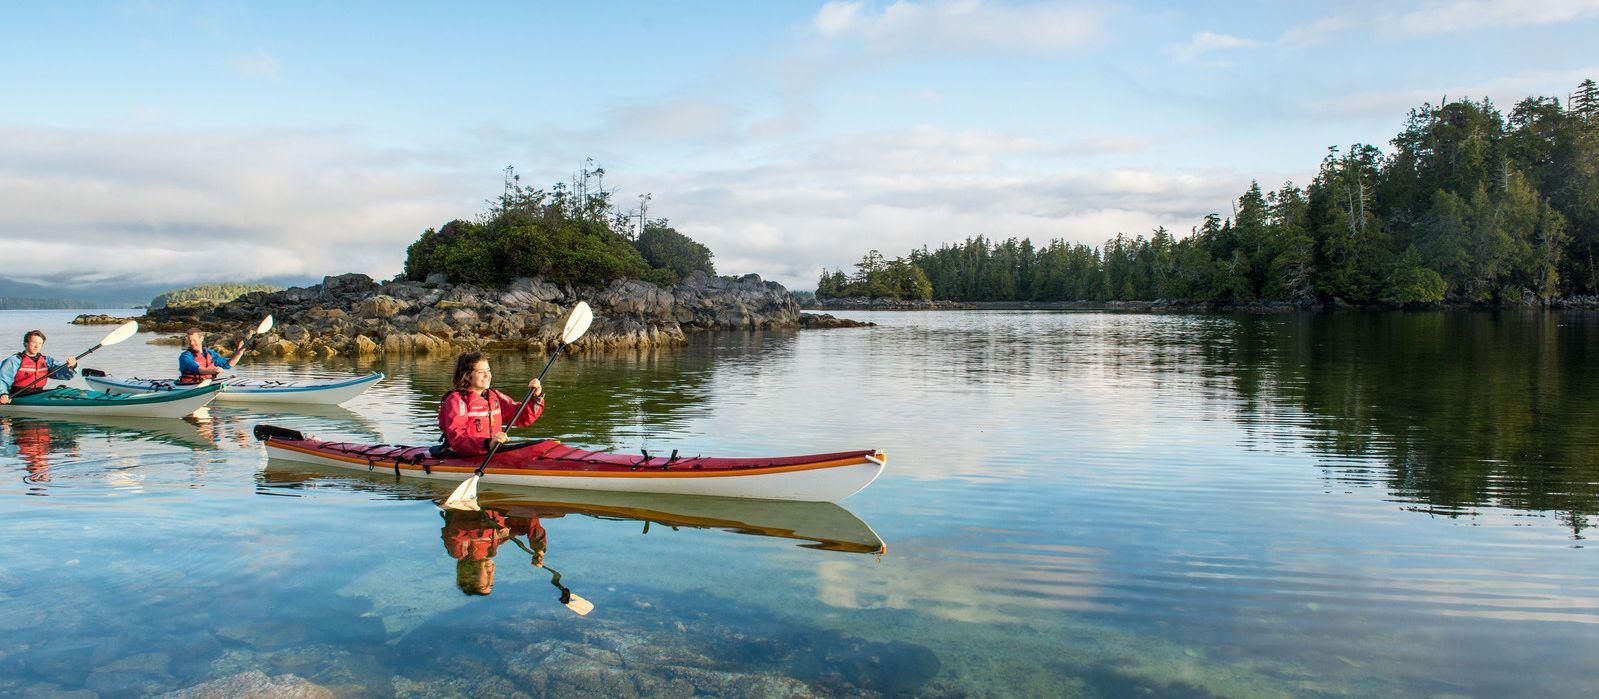 Kanugruppe paddelt an den Tiny Group Inseln vorbei